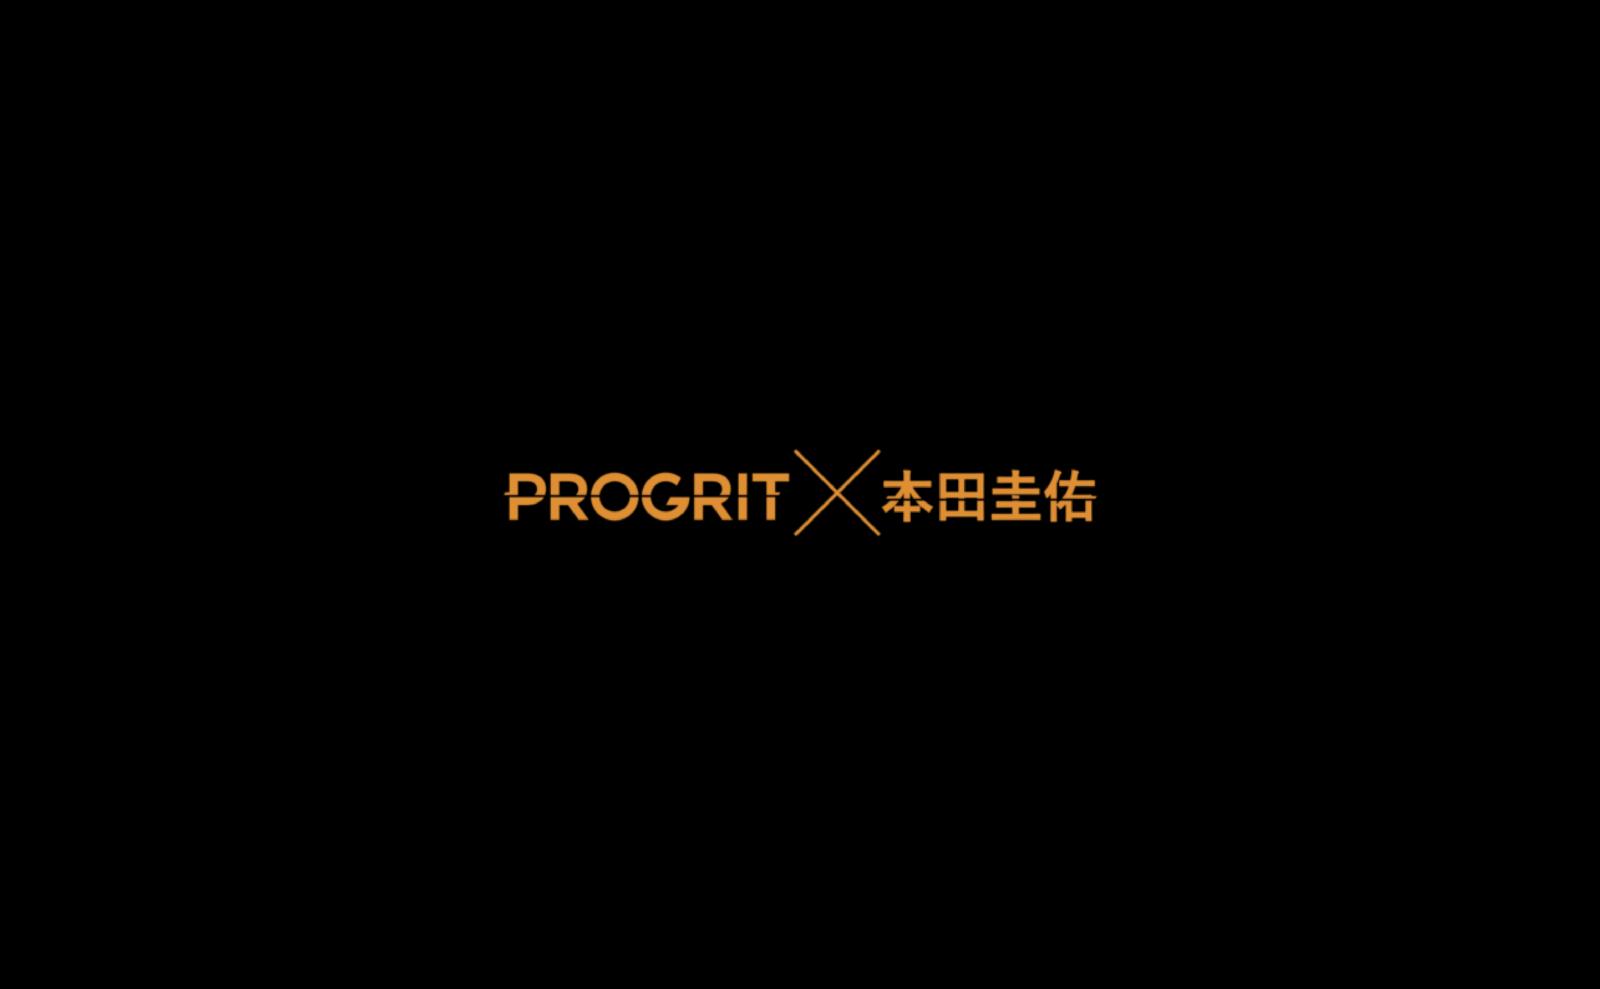 PROGRIT__-3